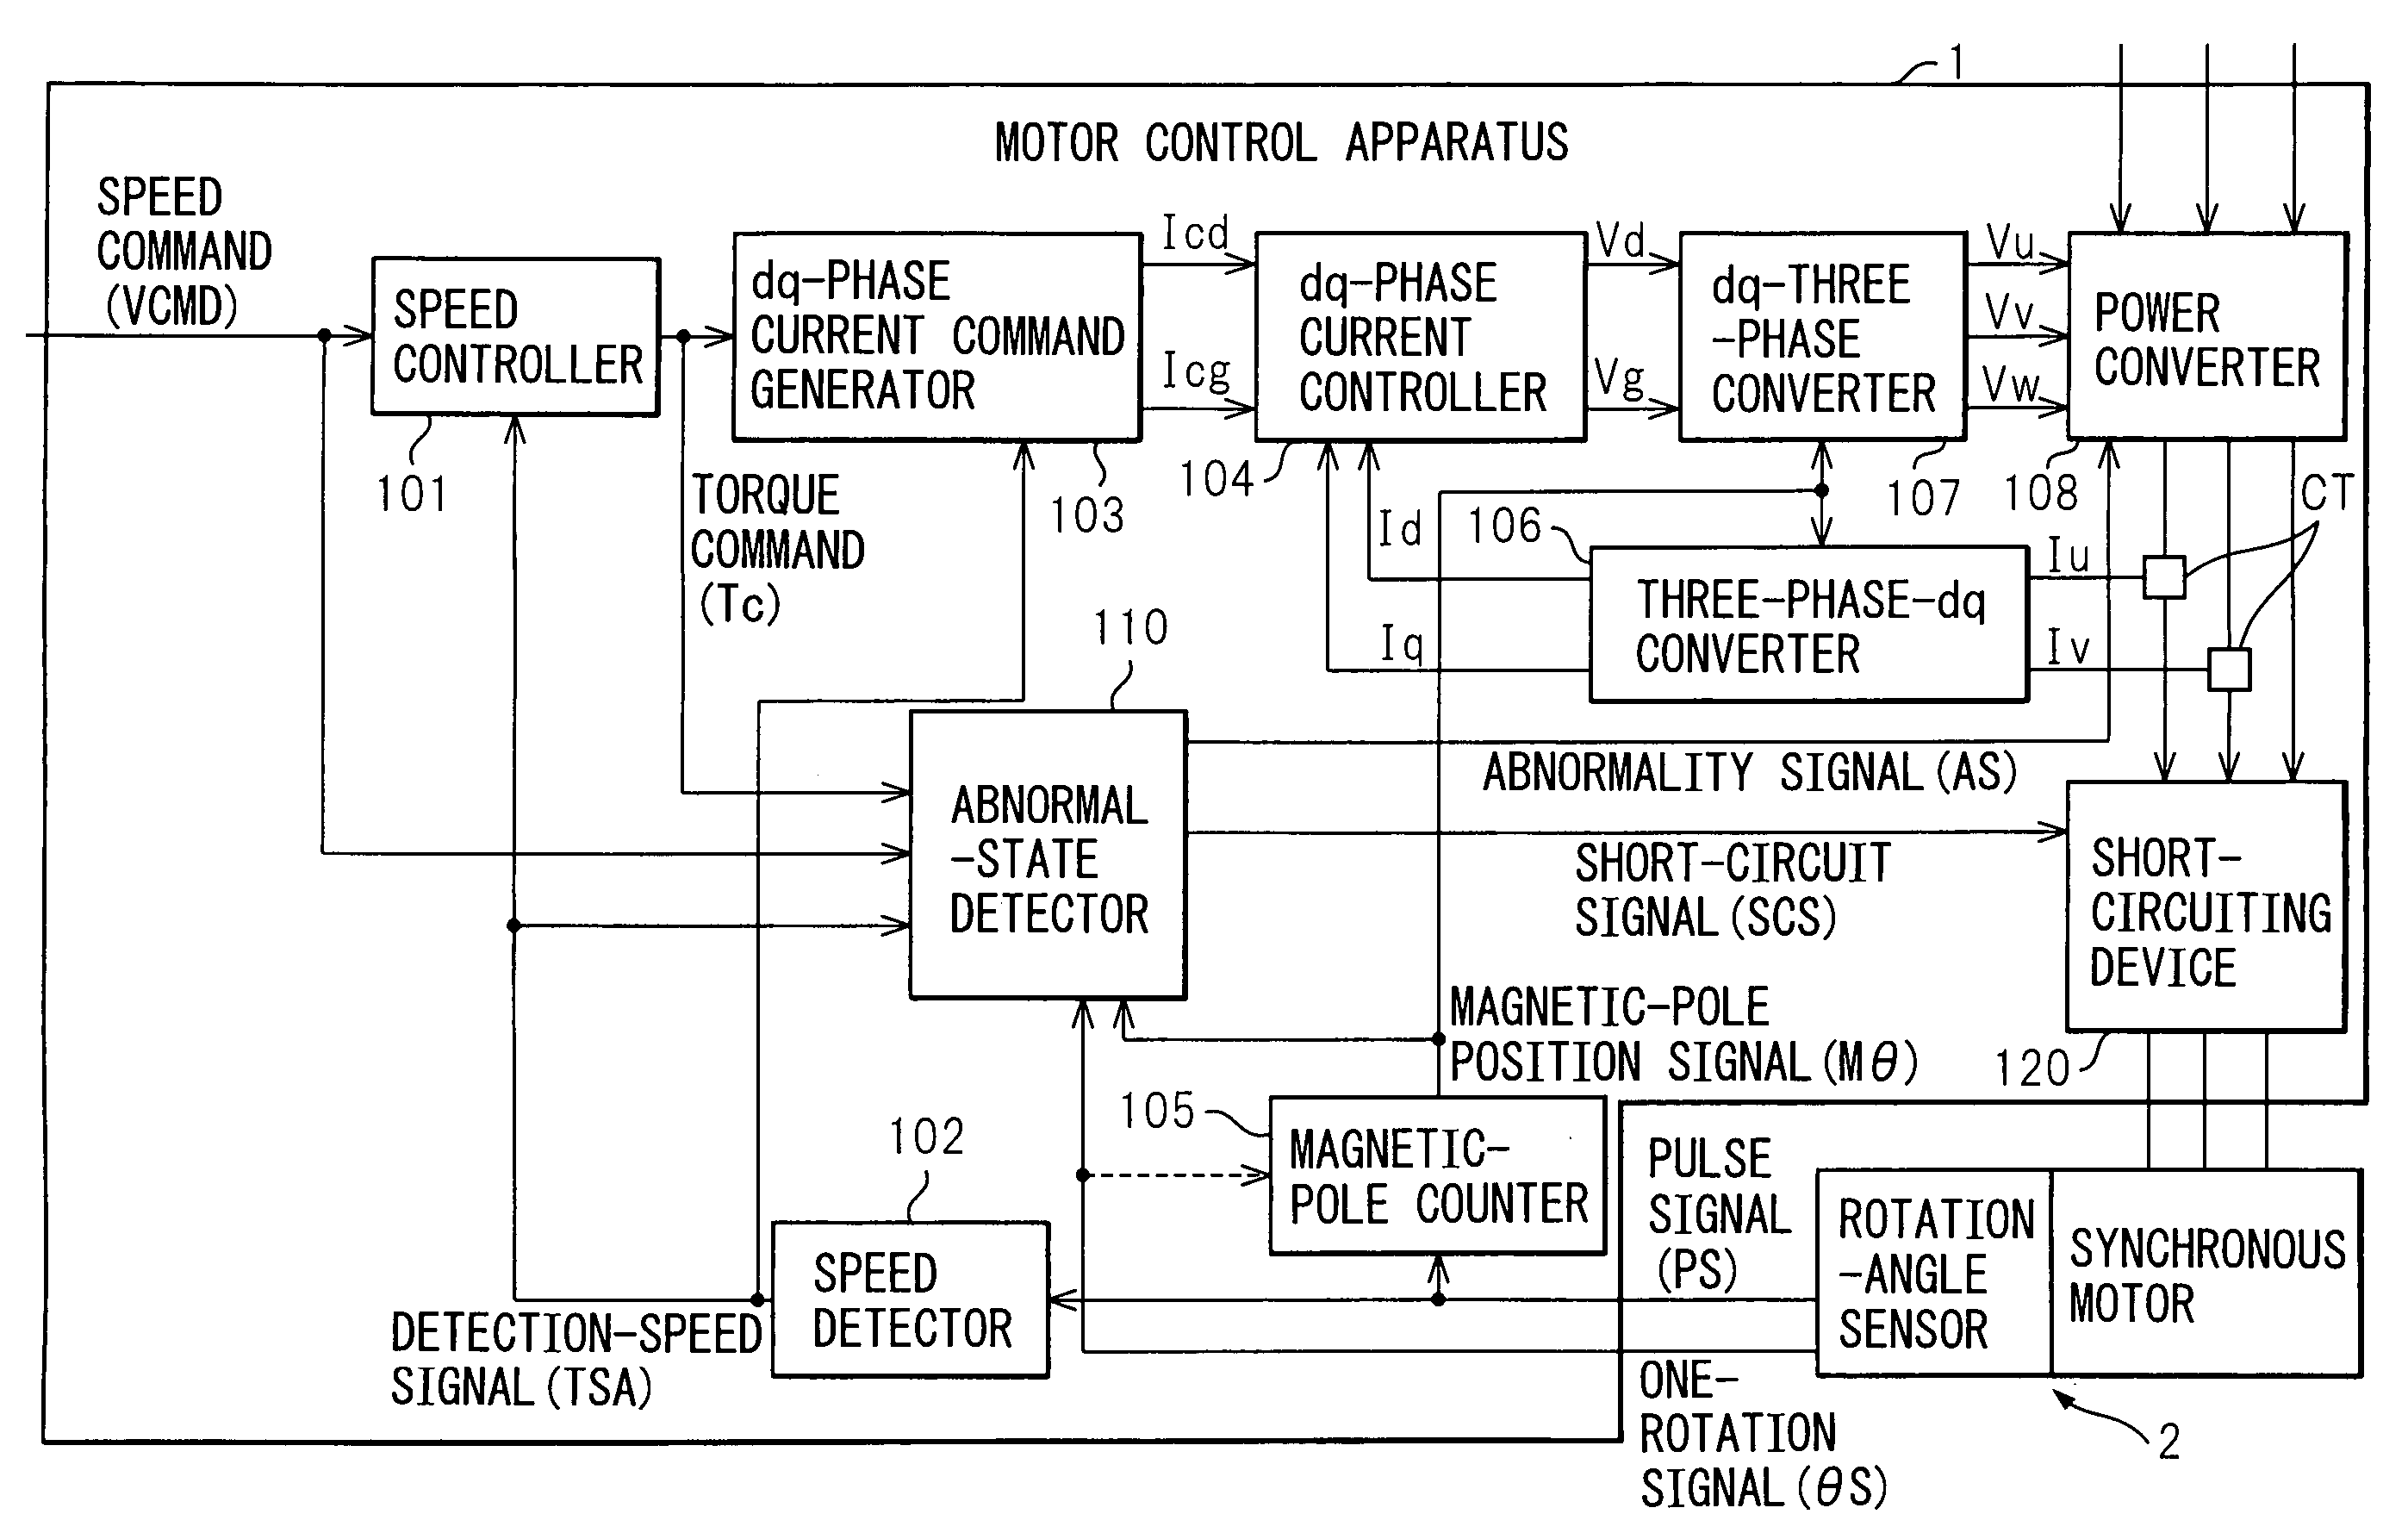 Patent Us7498761 Motor Control Method And Apparatus Short Circuit Detector Drawing